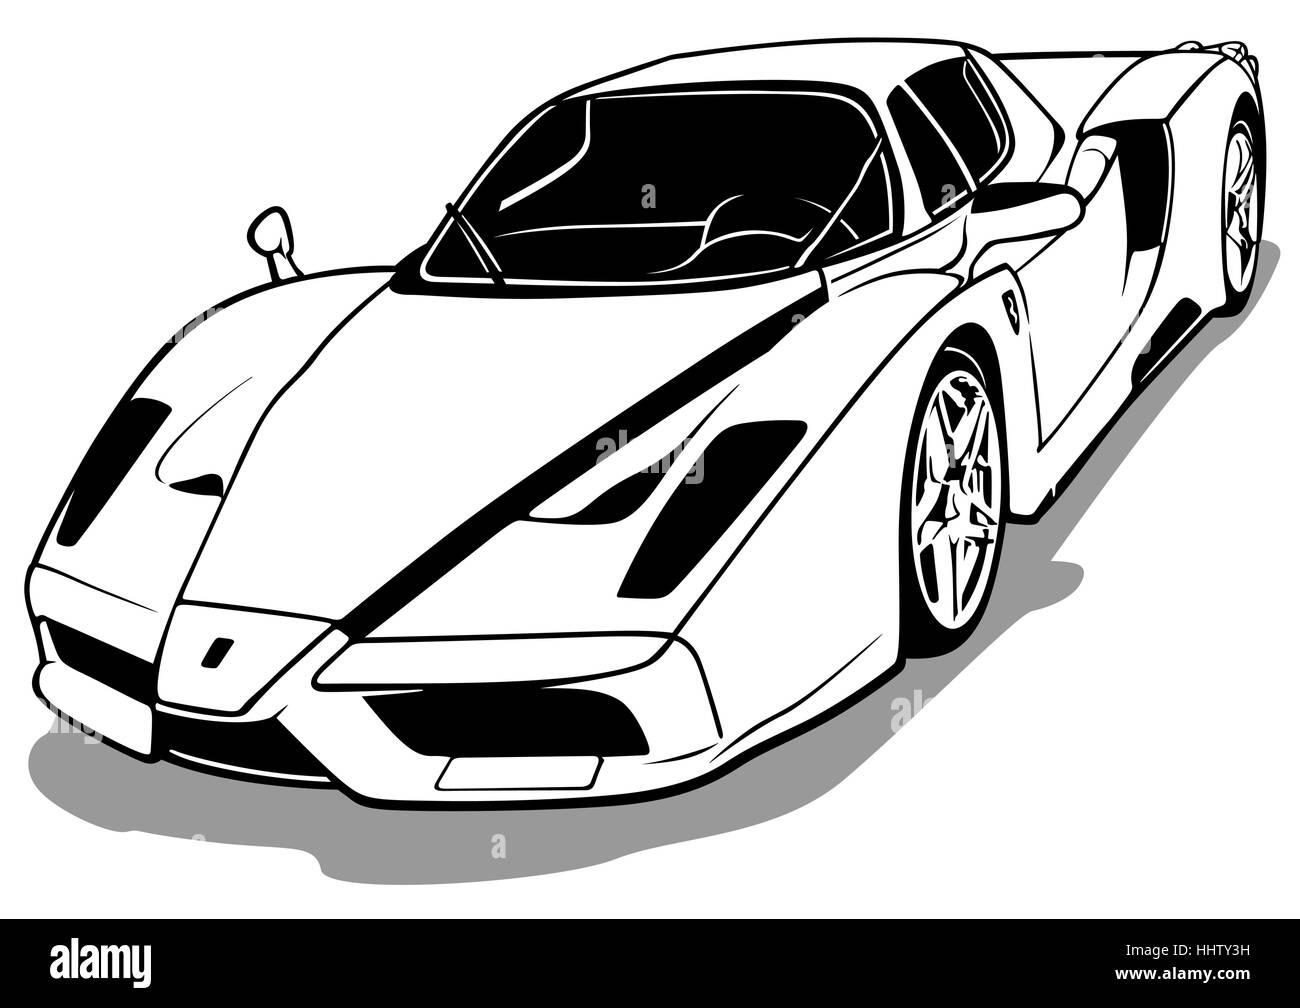 Luxurious Sports Car - Stock Image